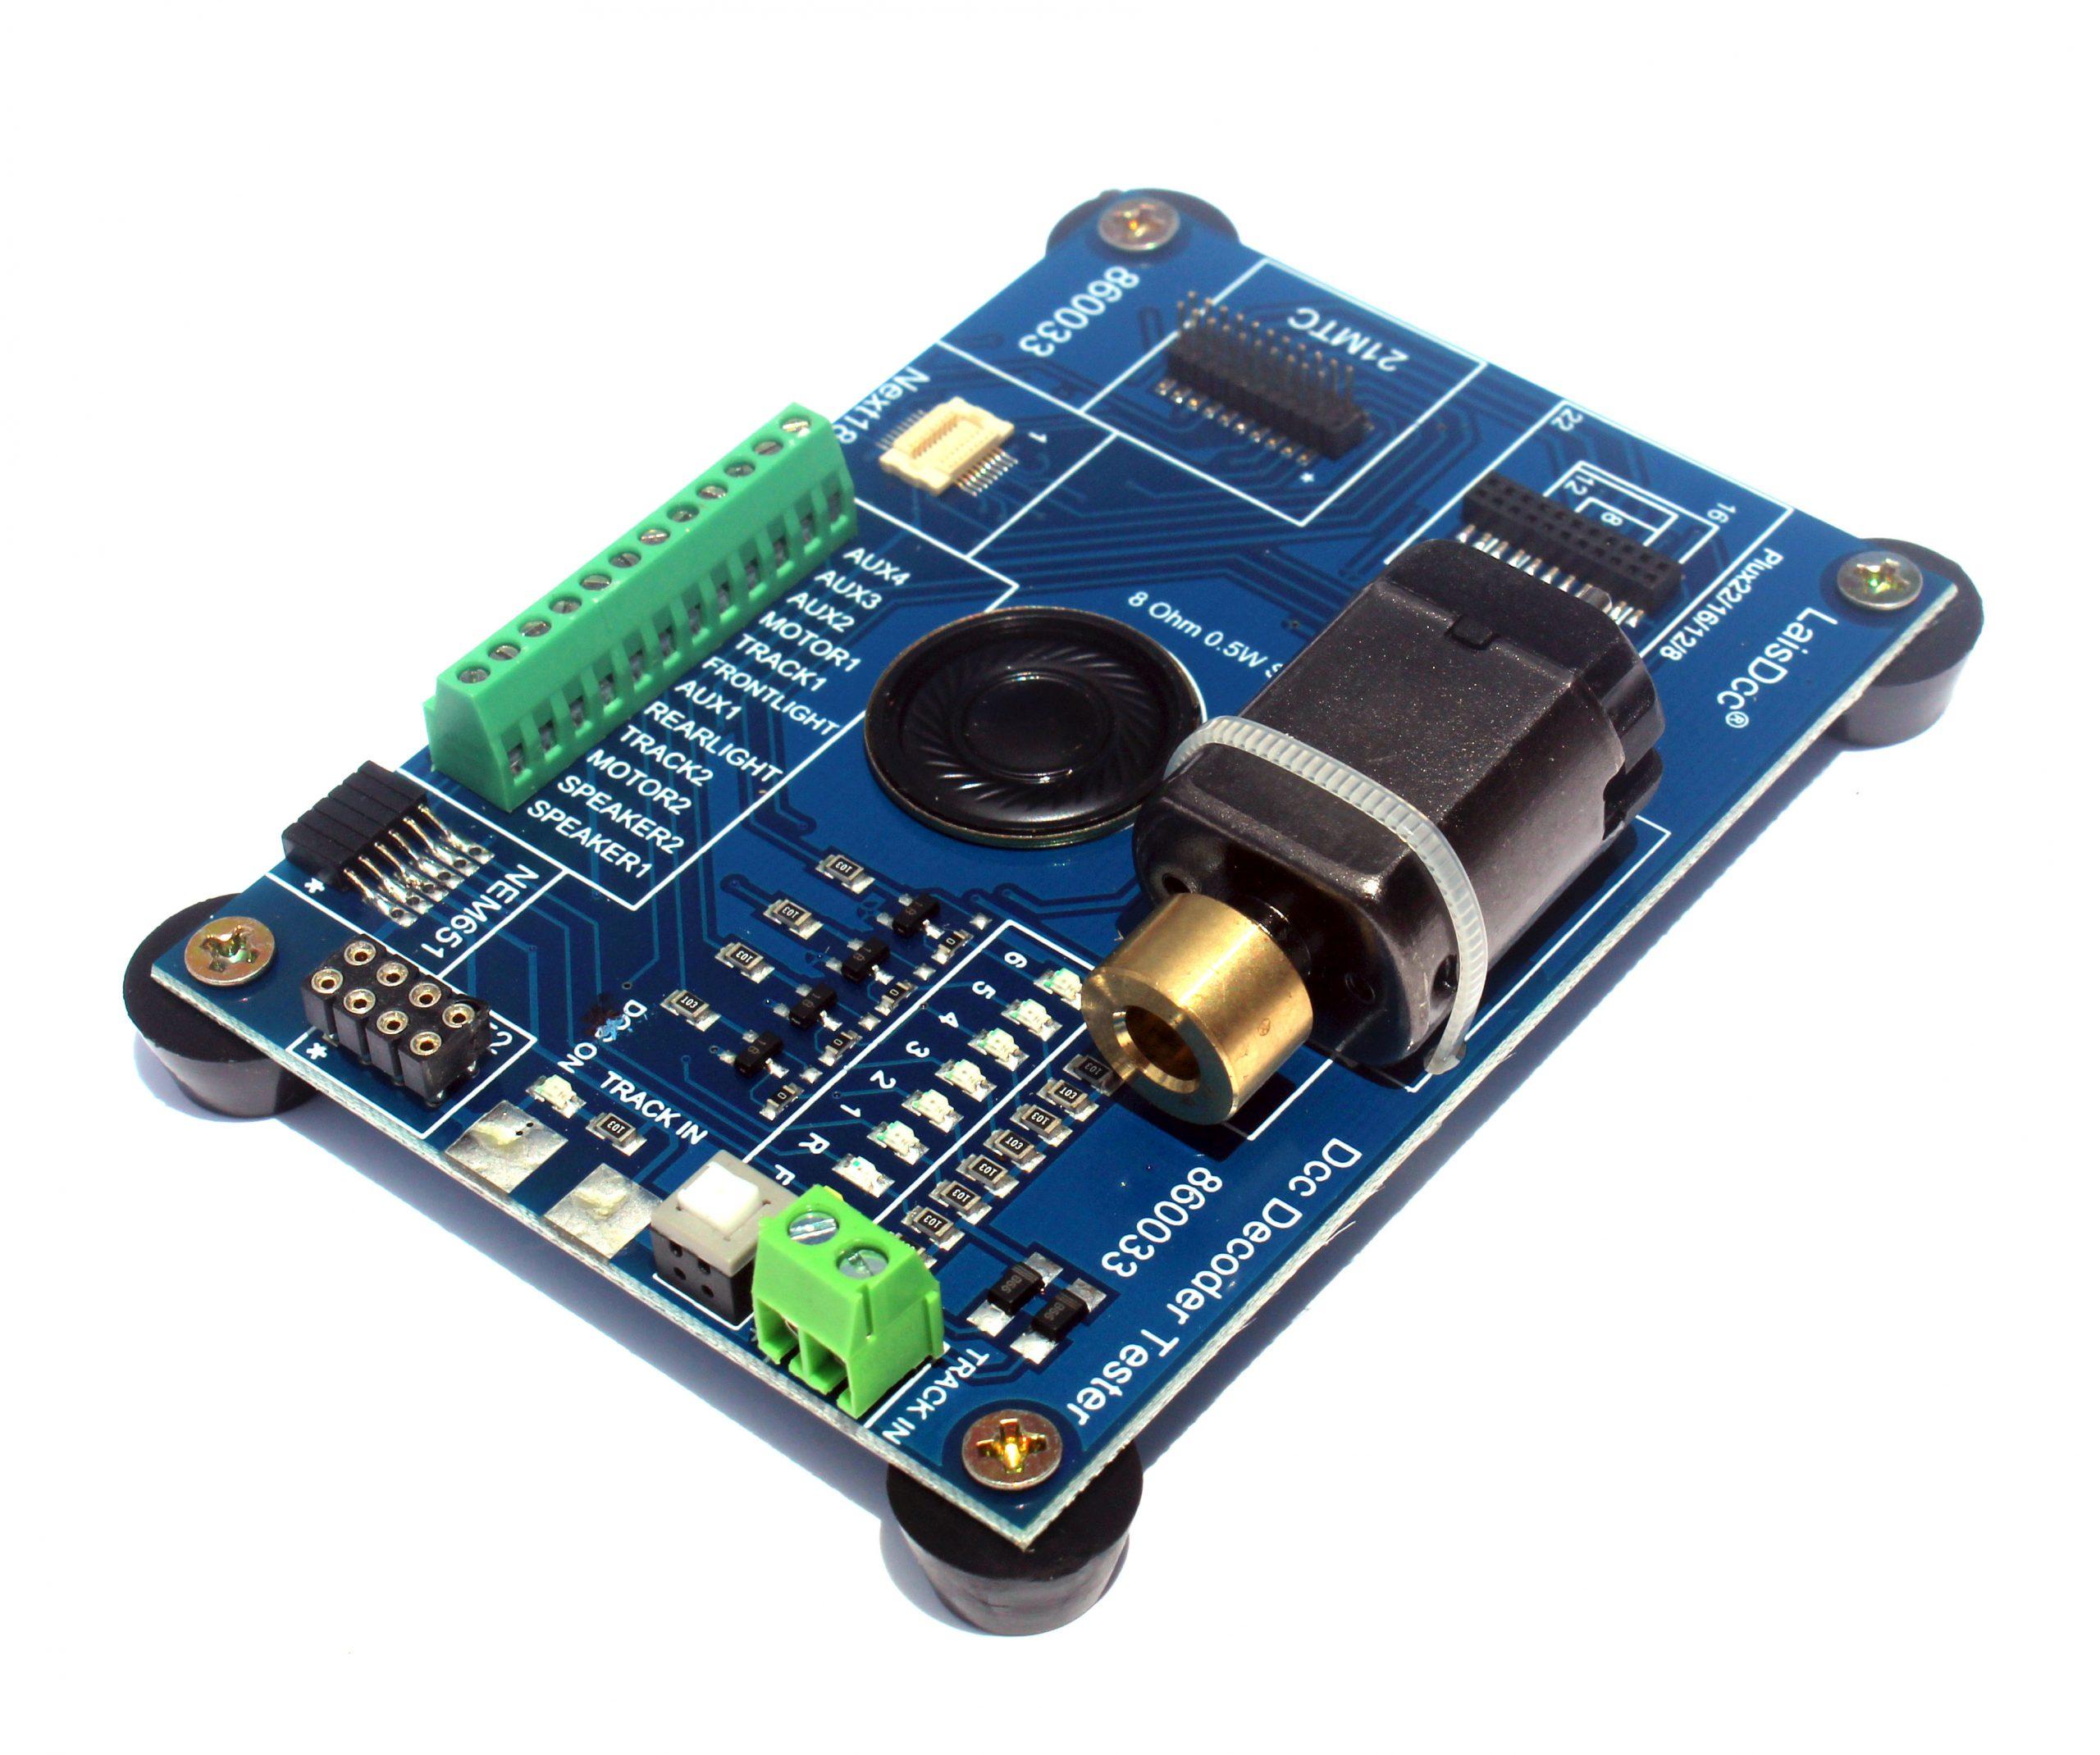 LaisDcc DCC Decoder Tester